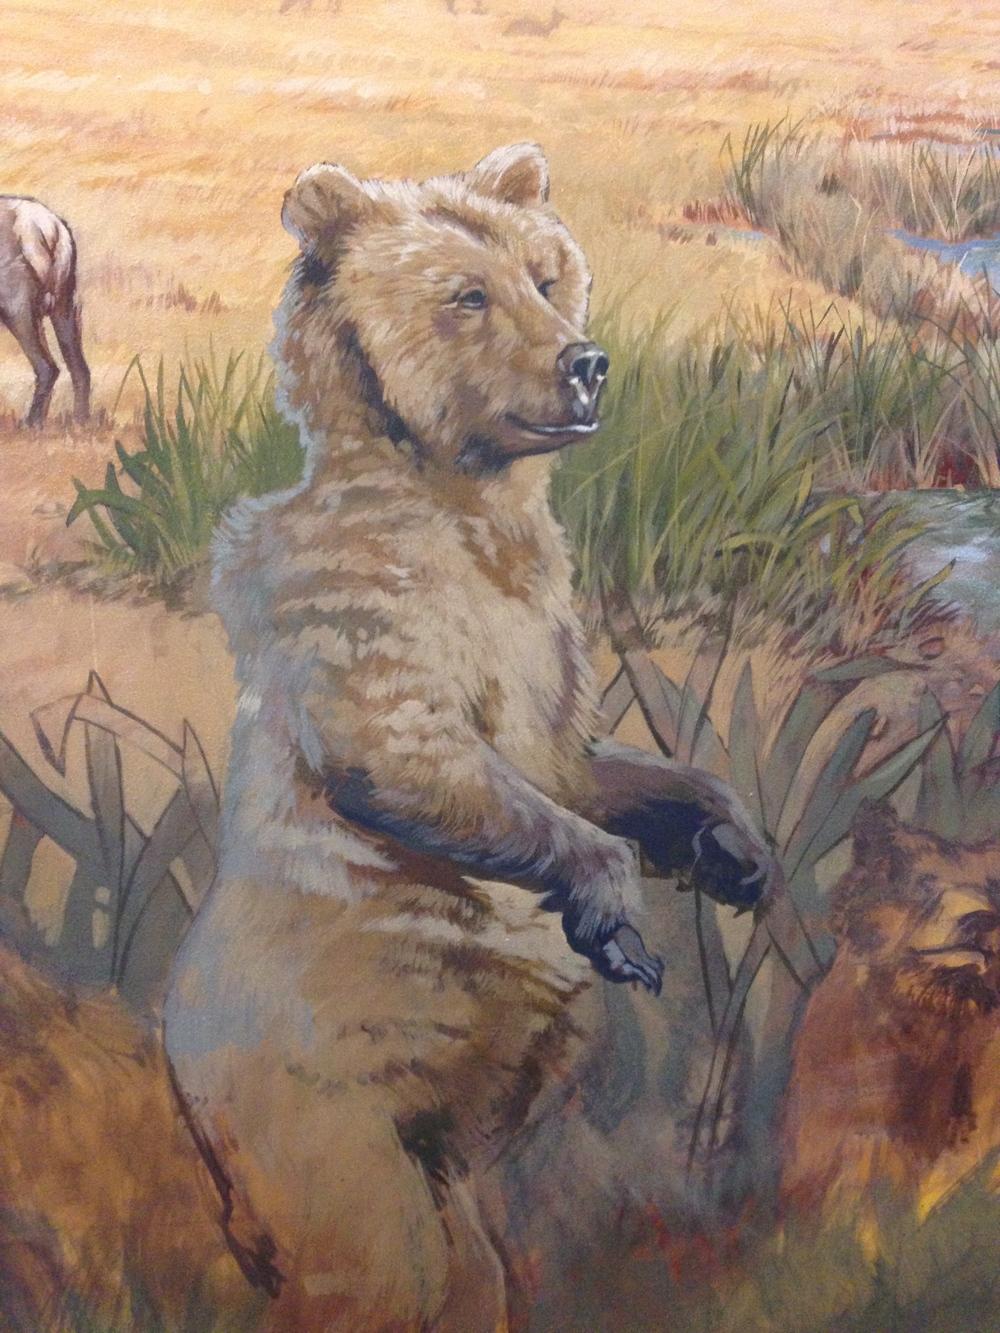 mural_HAHS_detail2.jpg